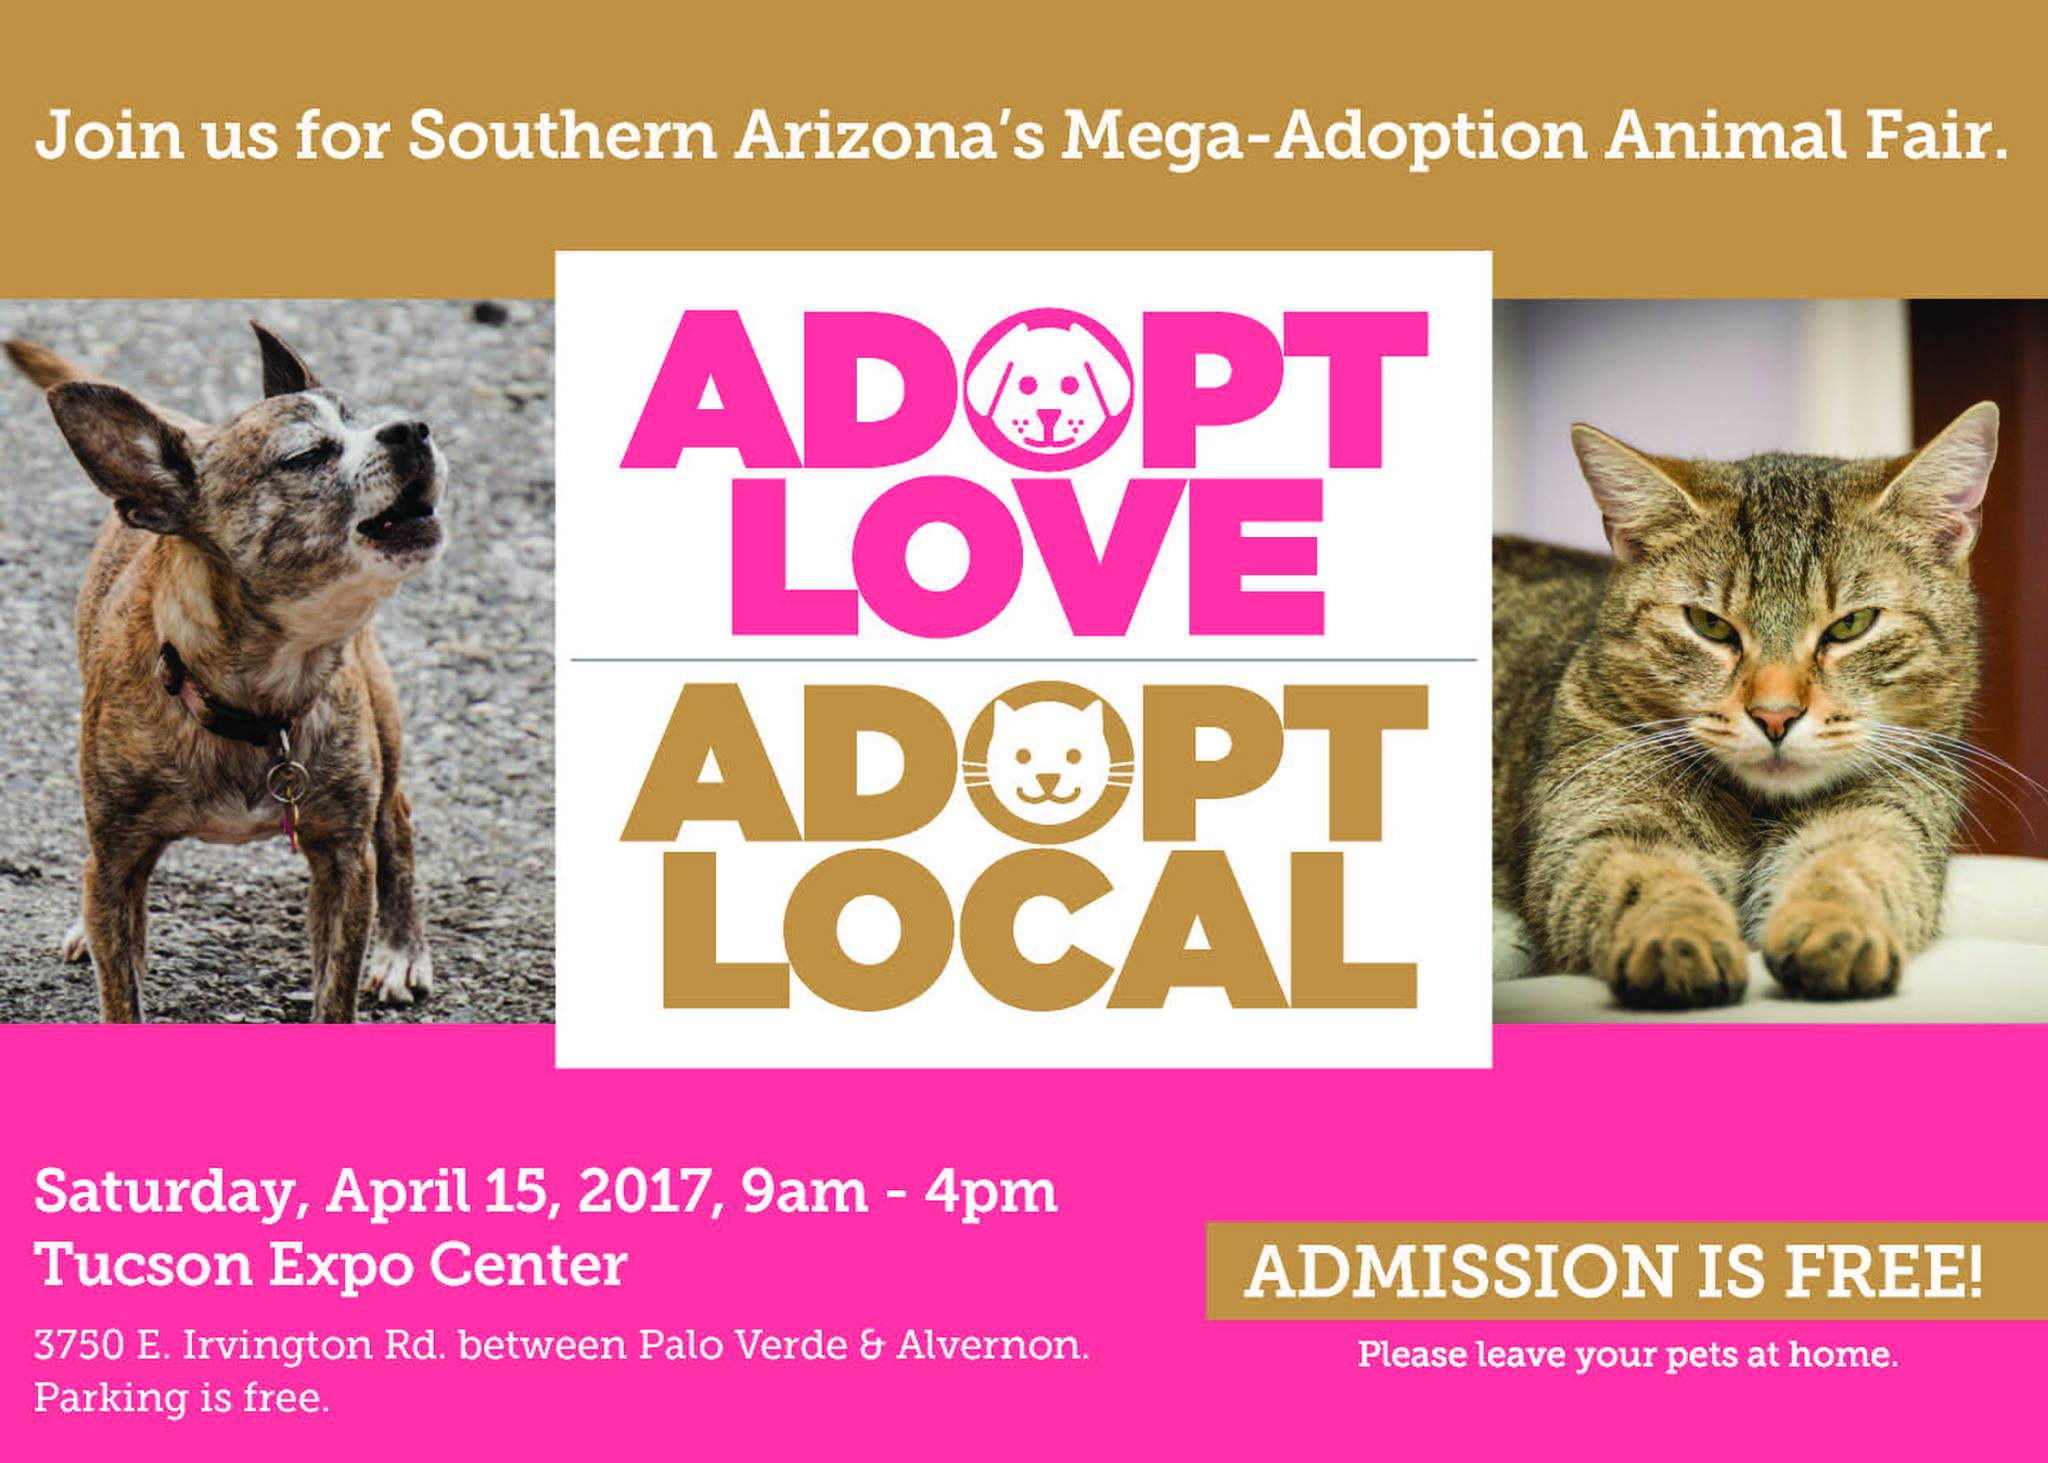 Adopt Love Adopt Local